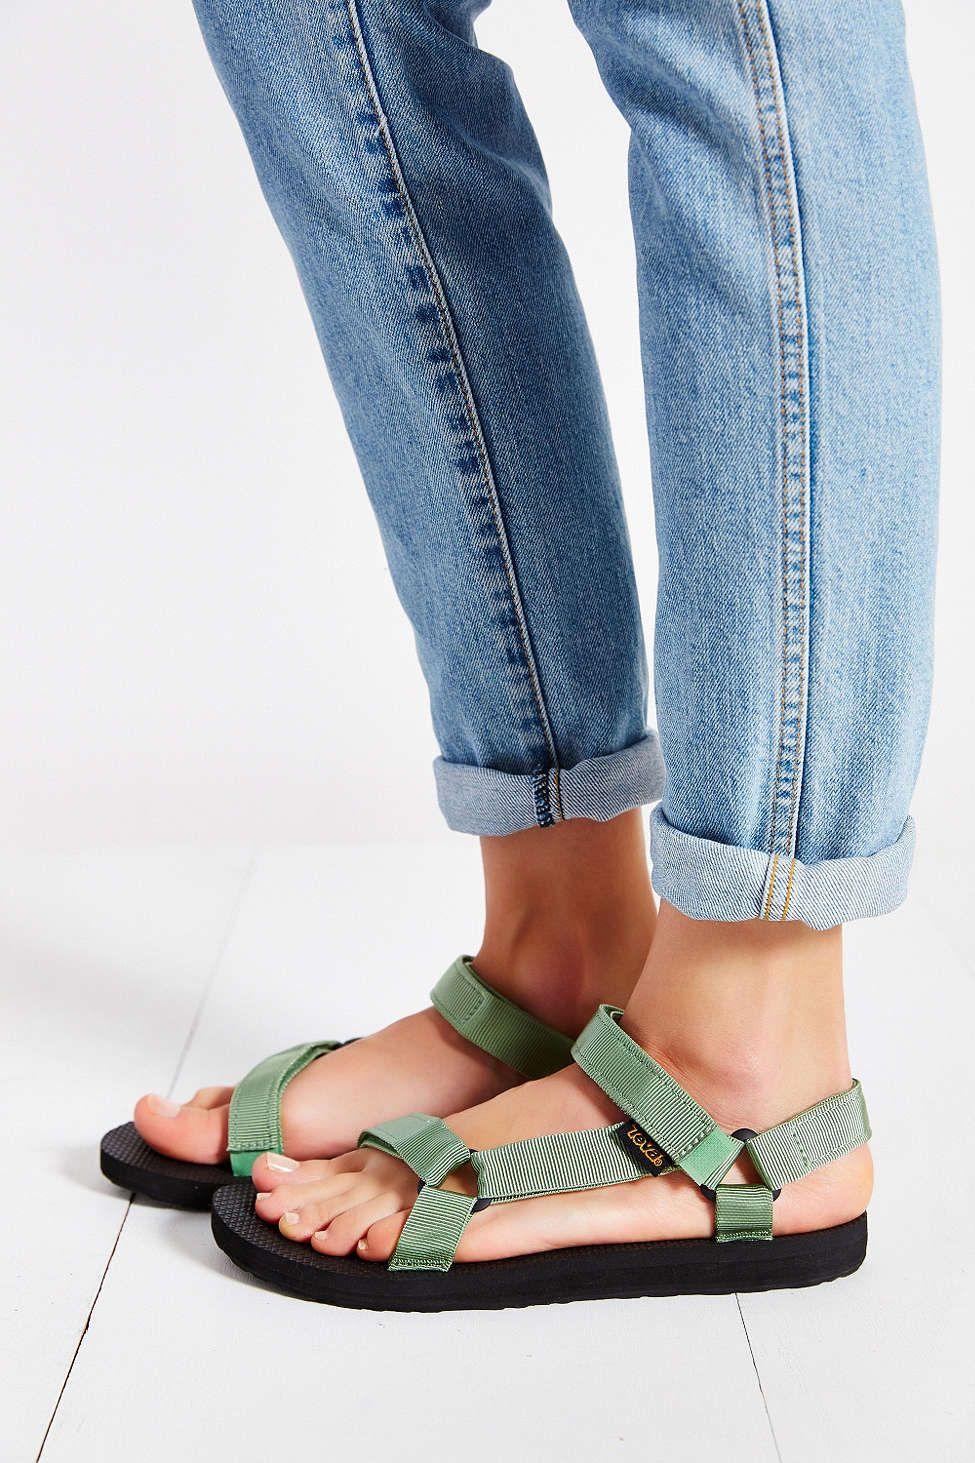 I Love The Authentic 90s Colors Of This Vegan Teva Sandals